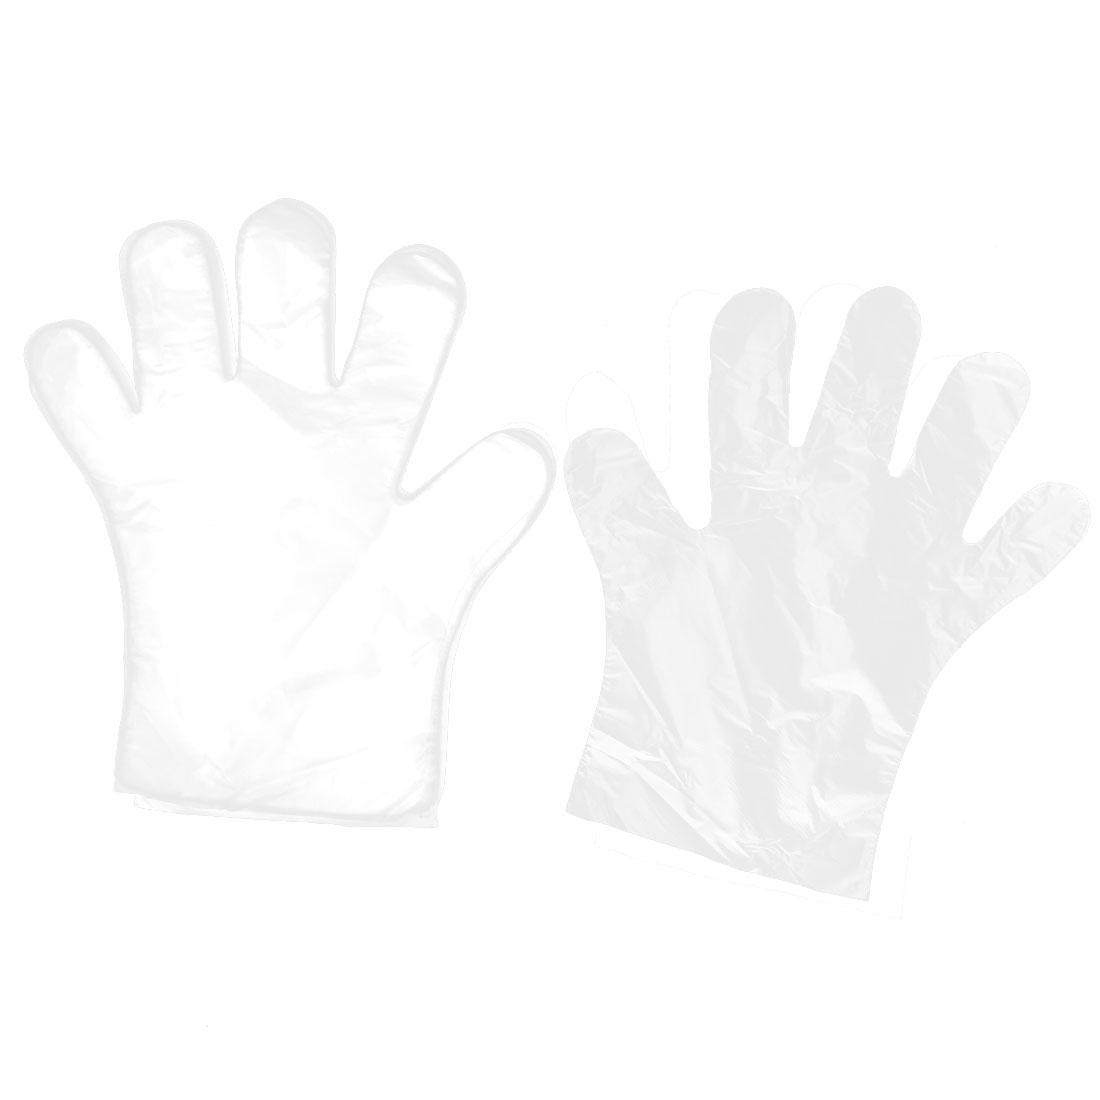 Home Kitchen Restaurant Hygiene Food Service Hand Disposable Gloves Clear 100pcs